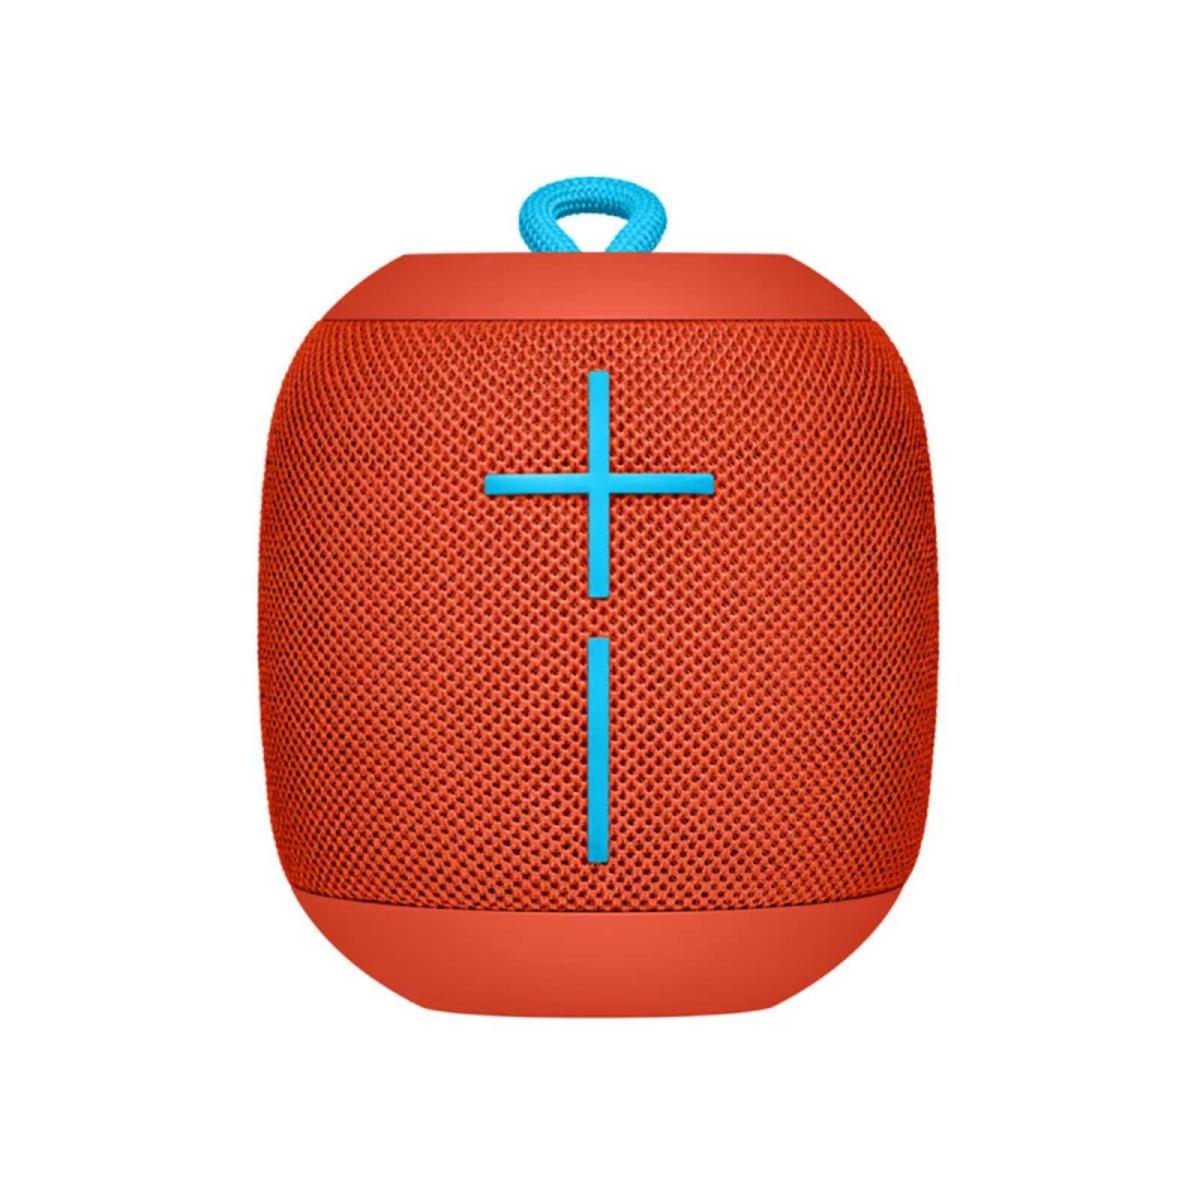 WONDERBOOM Portable Bluetooth Speaker - Fireball Red